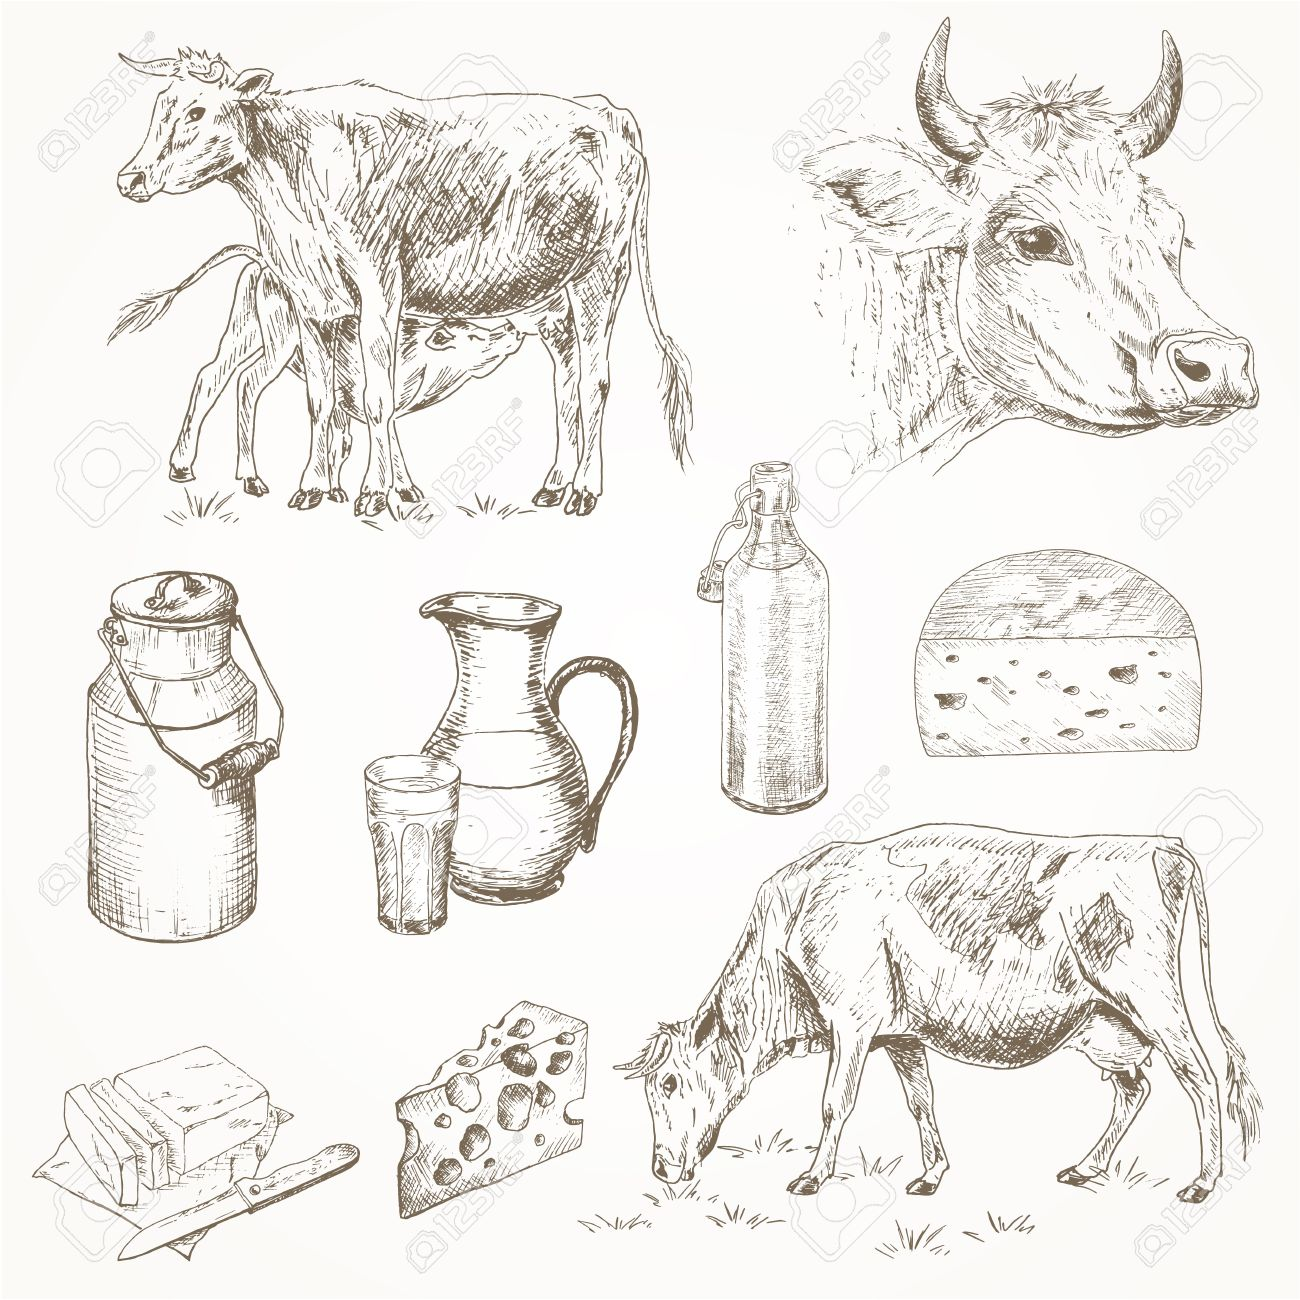 Dairy Cattle Farm Sketch Set Cow Eating Grass Cute Calf Drinks Milk Cows